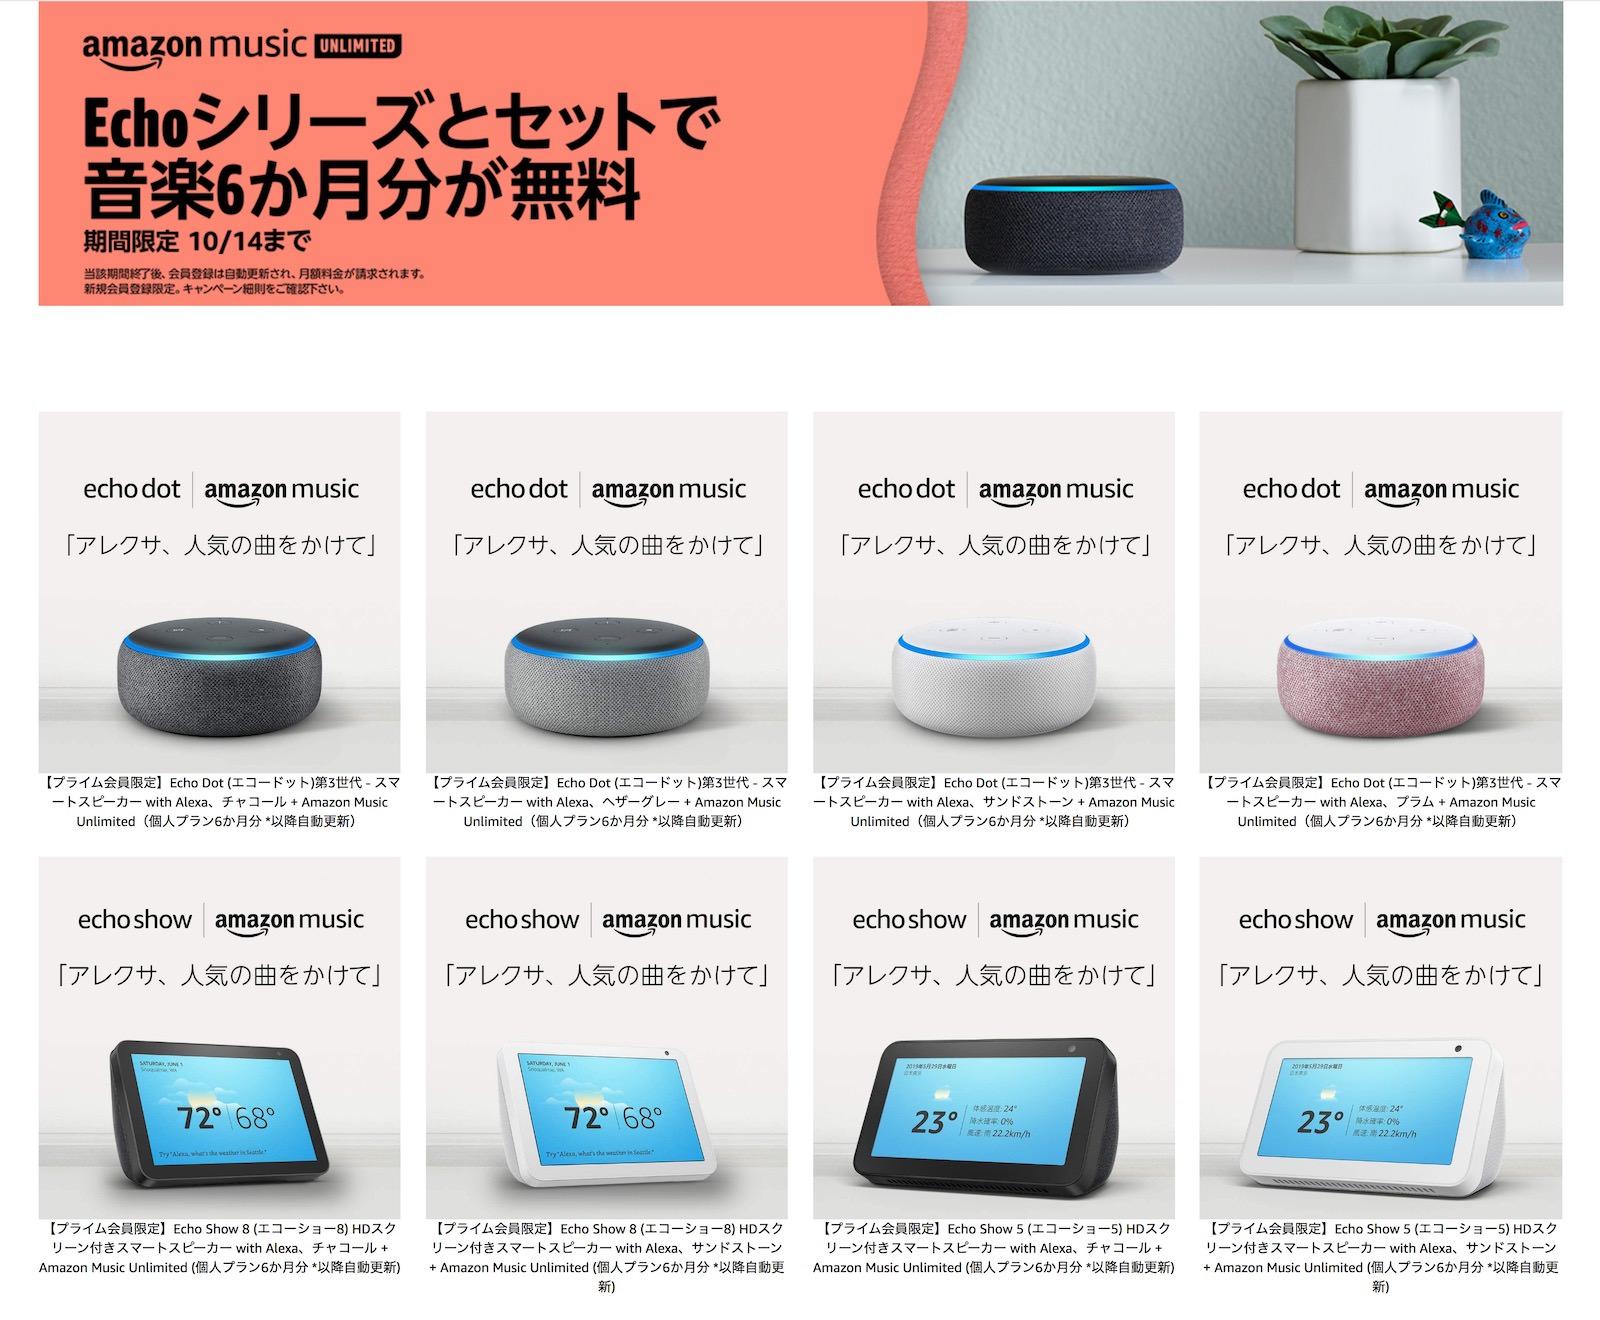 Echo series mega sale prime day